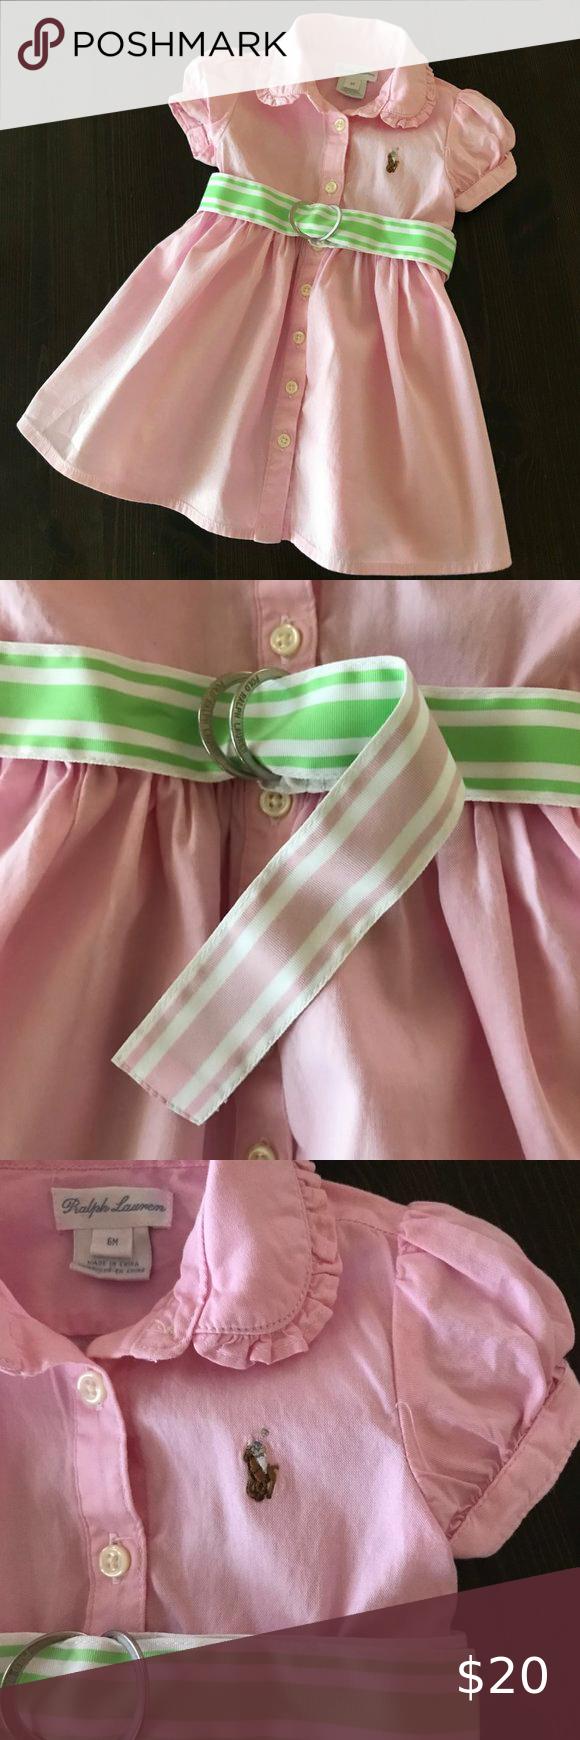 Ralph Lauren Pink Polo Shirt Dress Baby Girl Pre-owned. Never worn ...